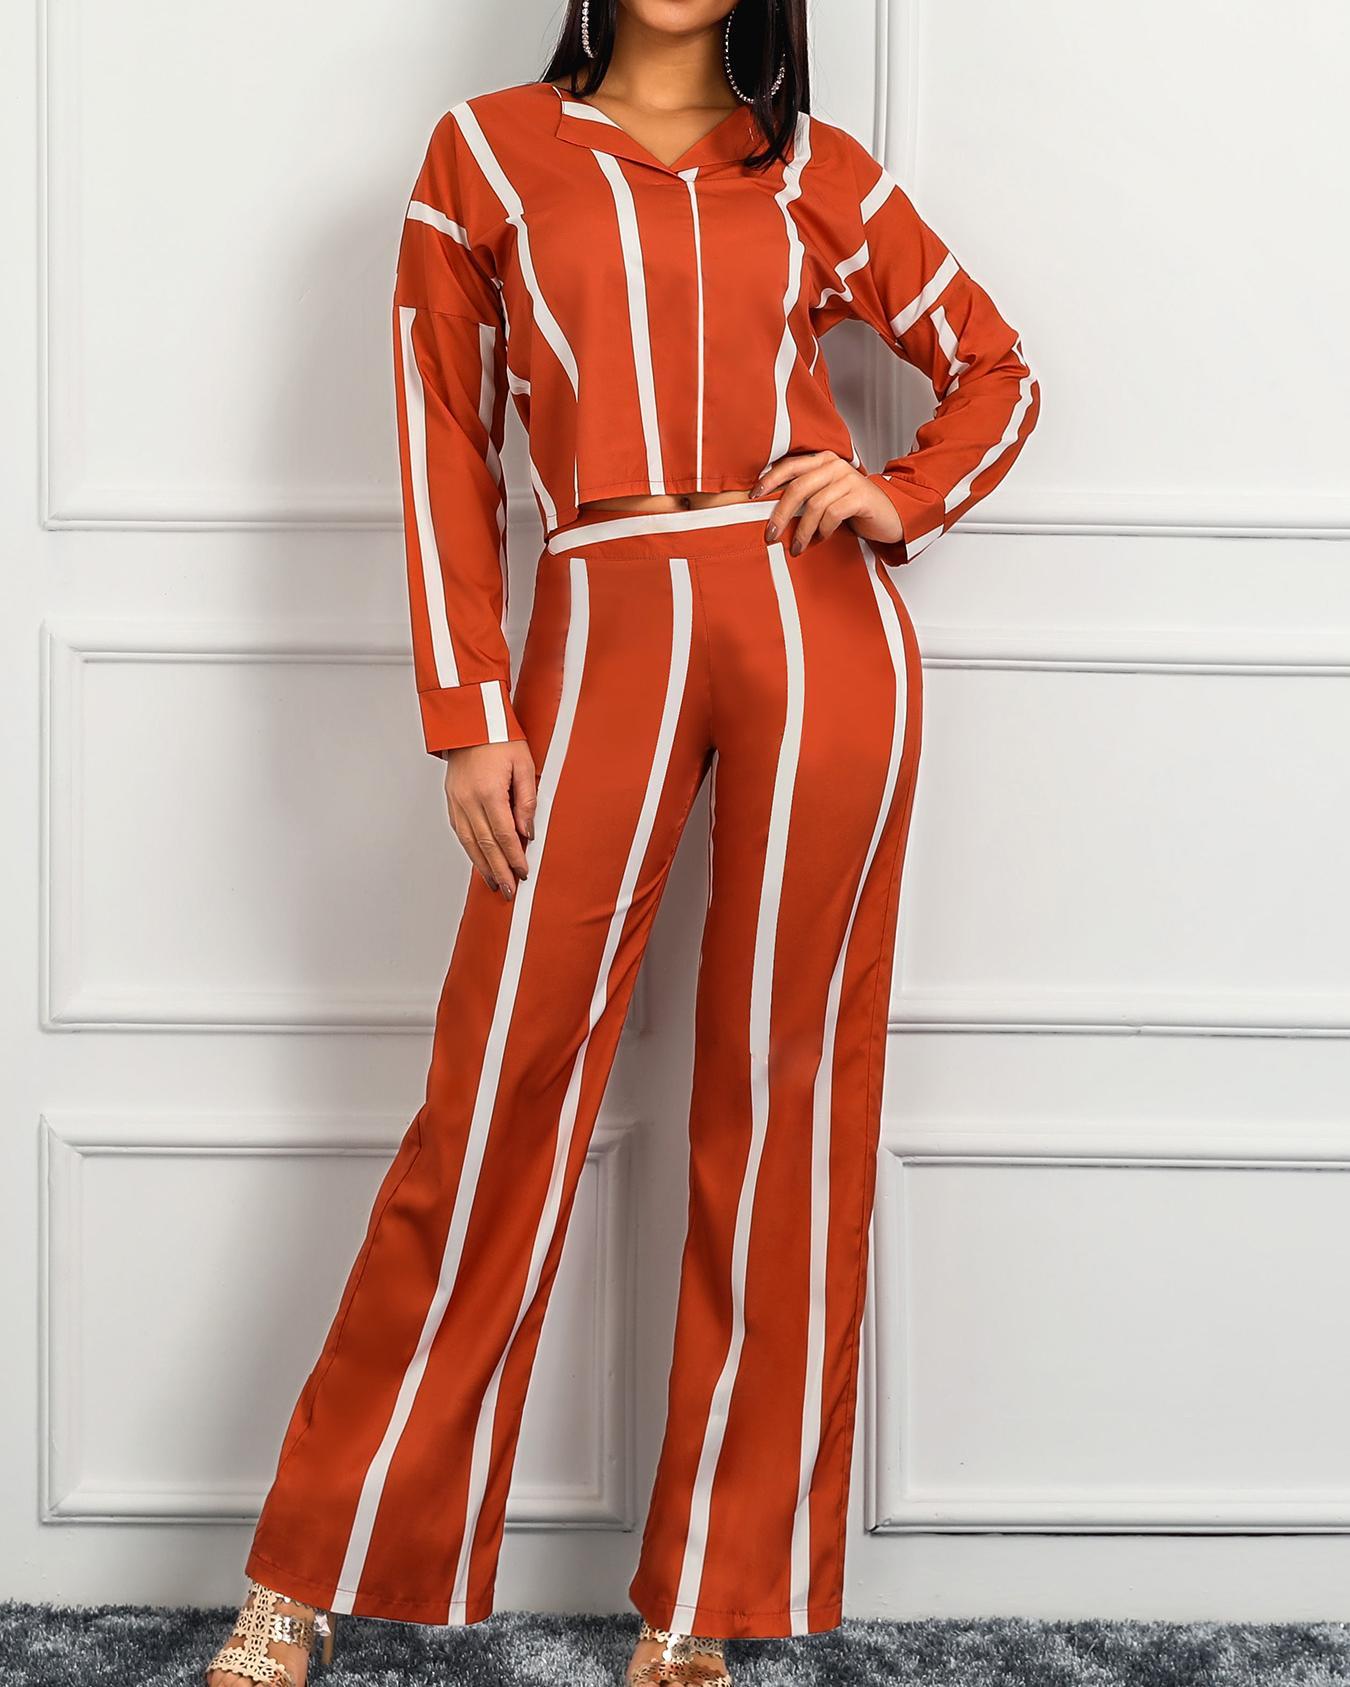 ivrose / Striped Print Leisure Blouse And Pants Set